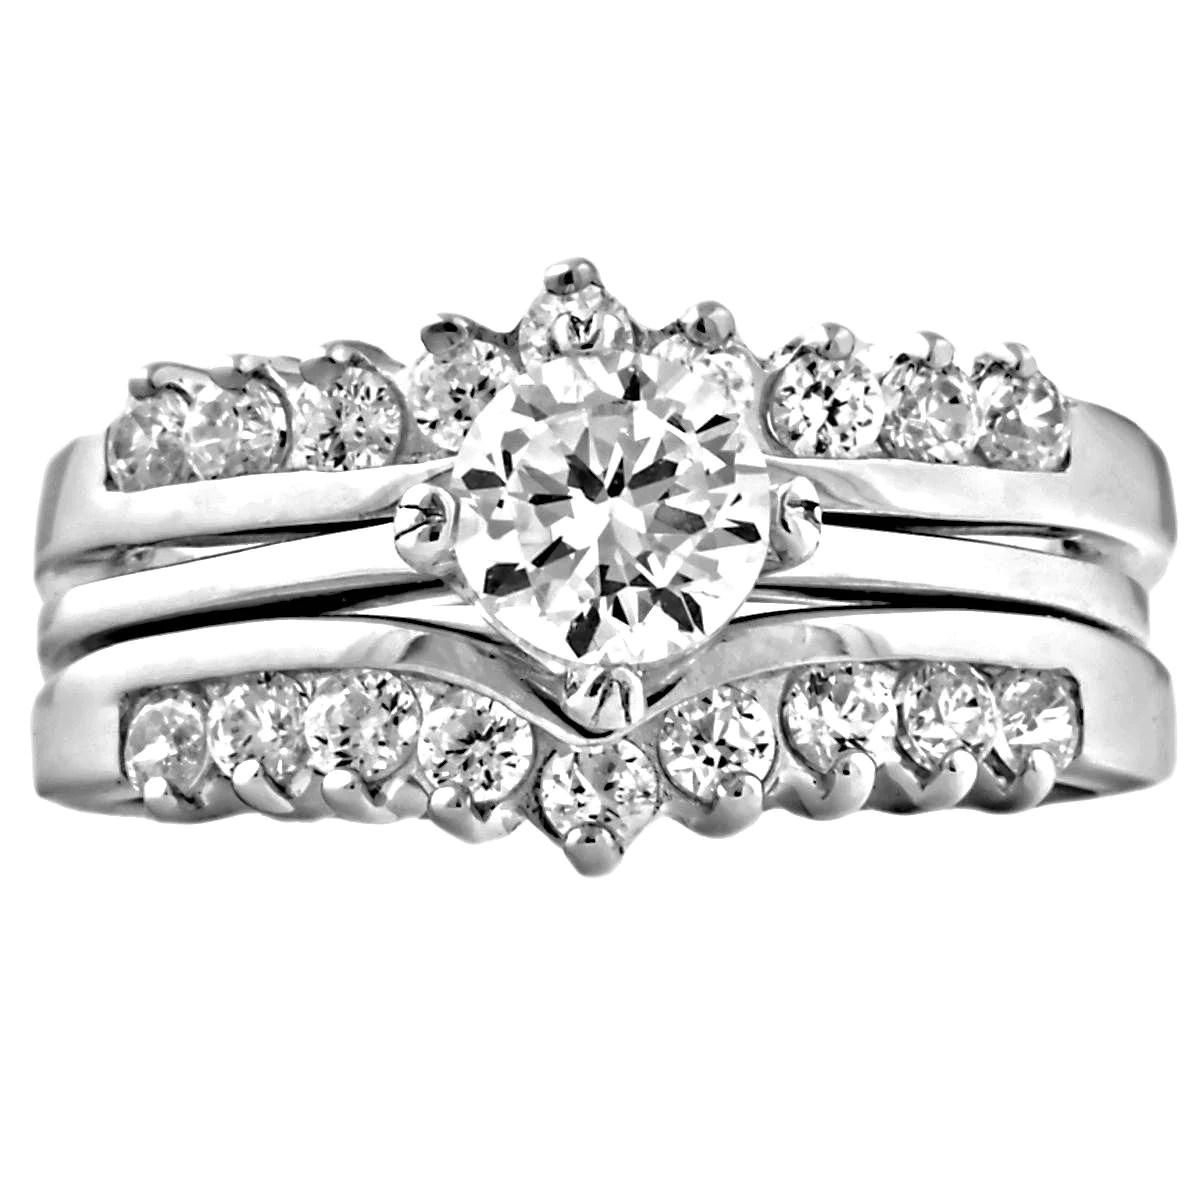 princess christina ice on fire cz wedding ring set with ring guard wedding ring guard Princess Christina Ice on Fire CZ Wedding Ring Set with Ring Guard Jewels com